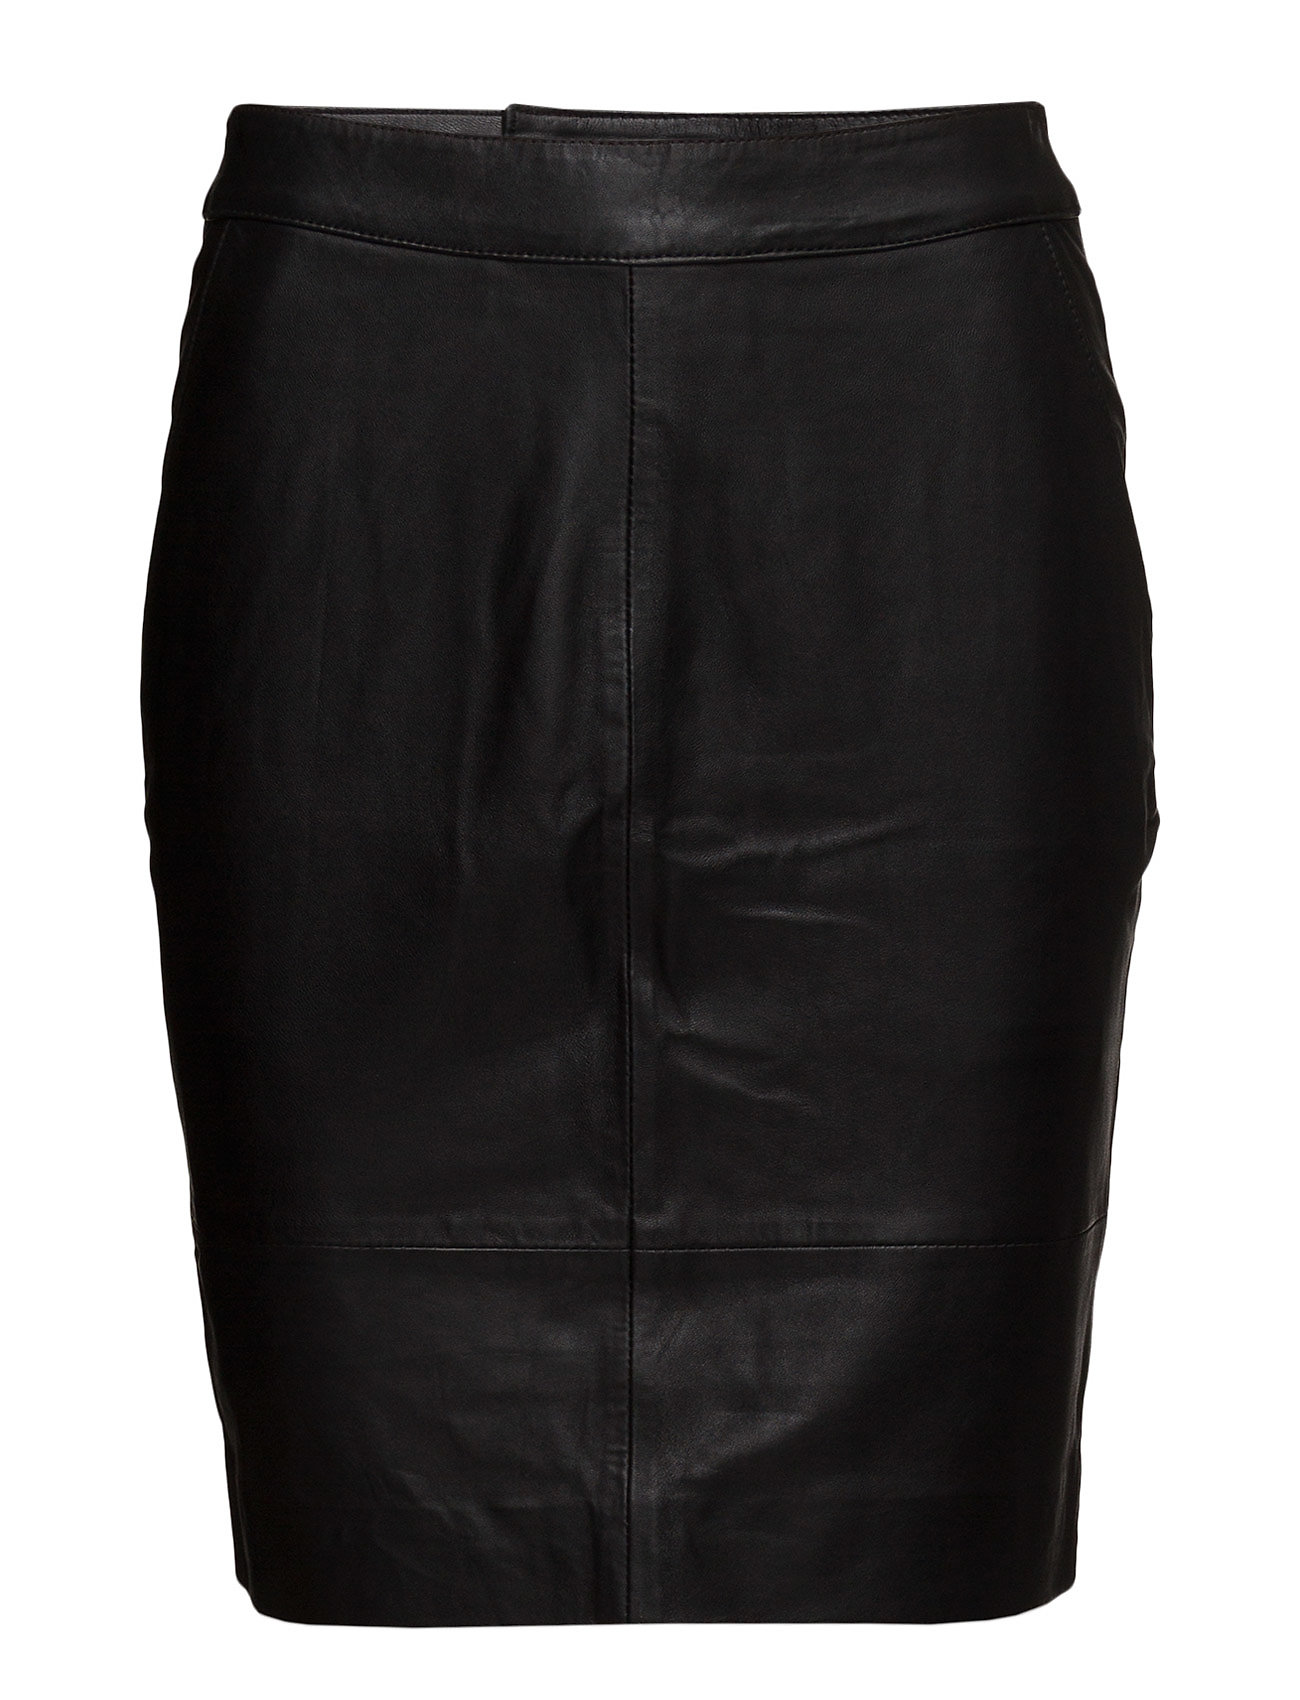 Gestuz CharGZ mini skirt NOOS - BLACK